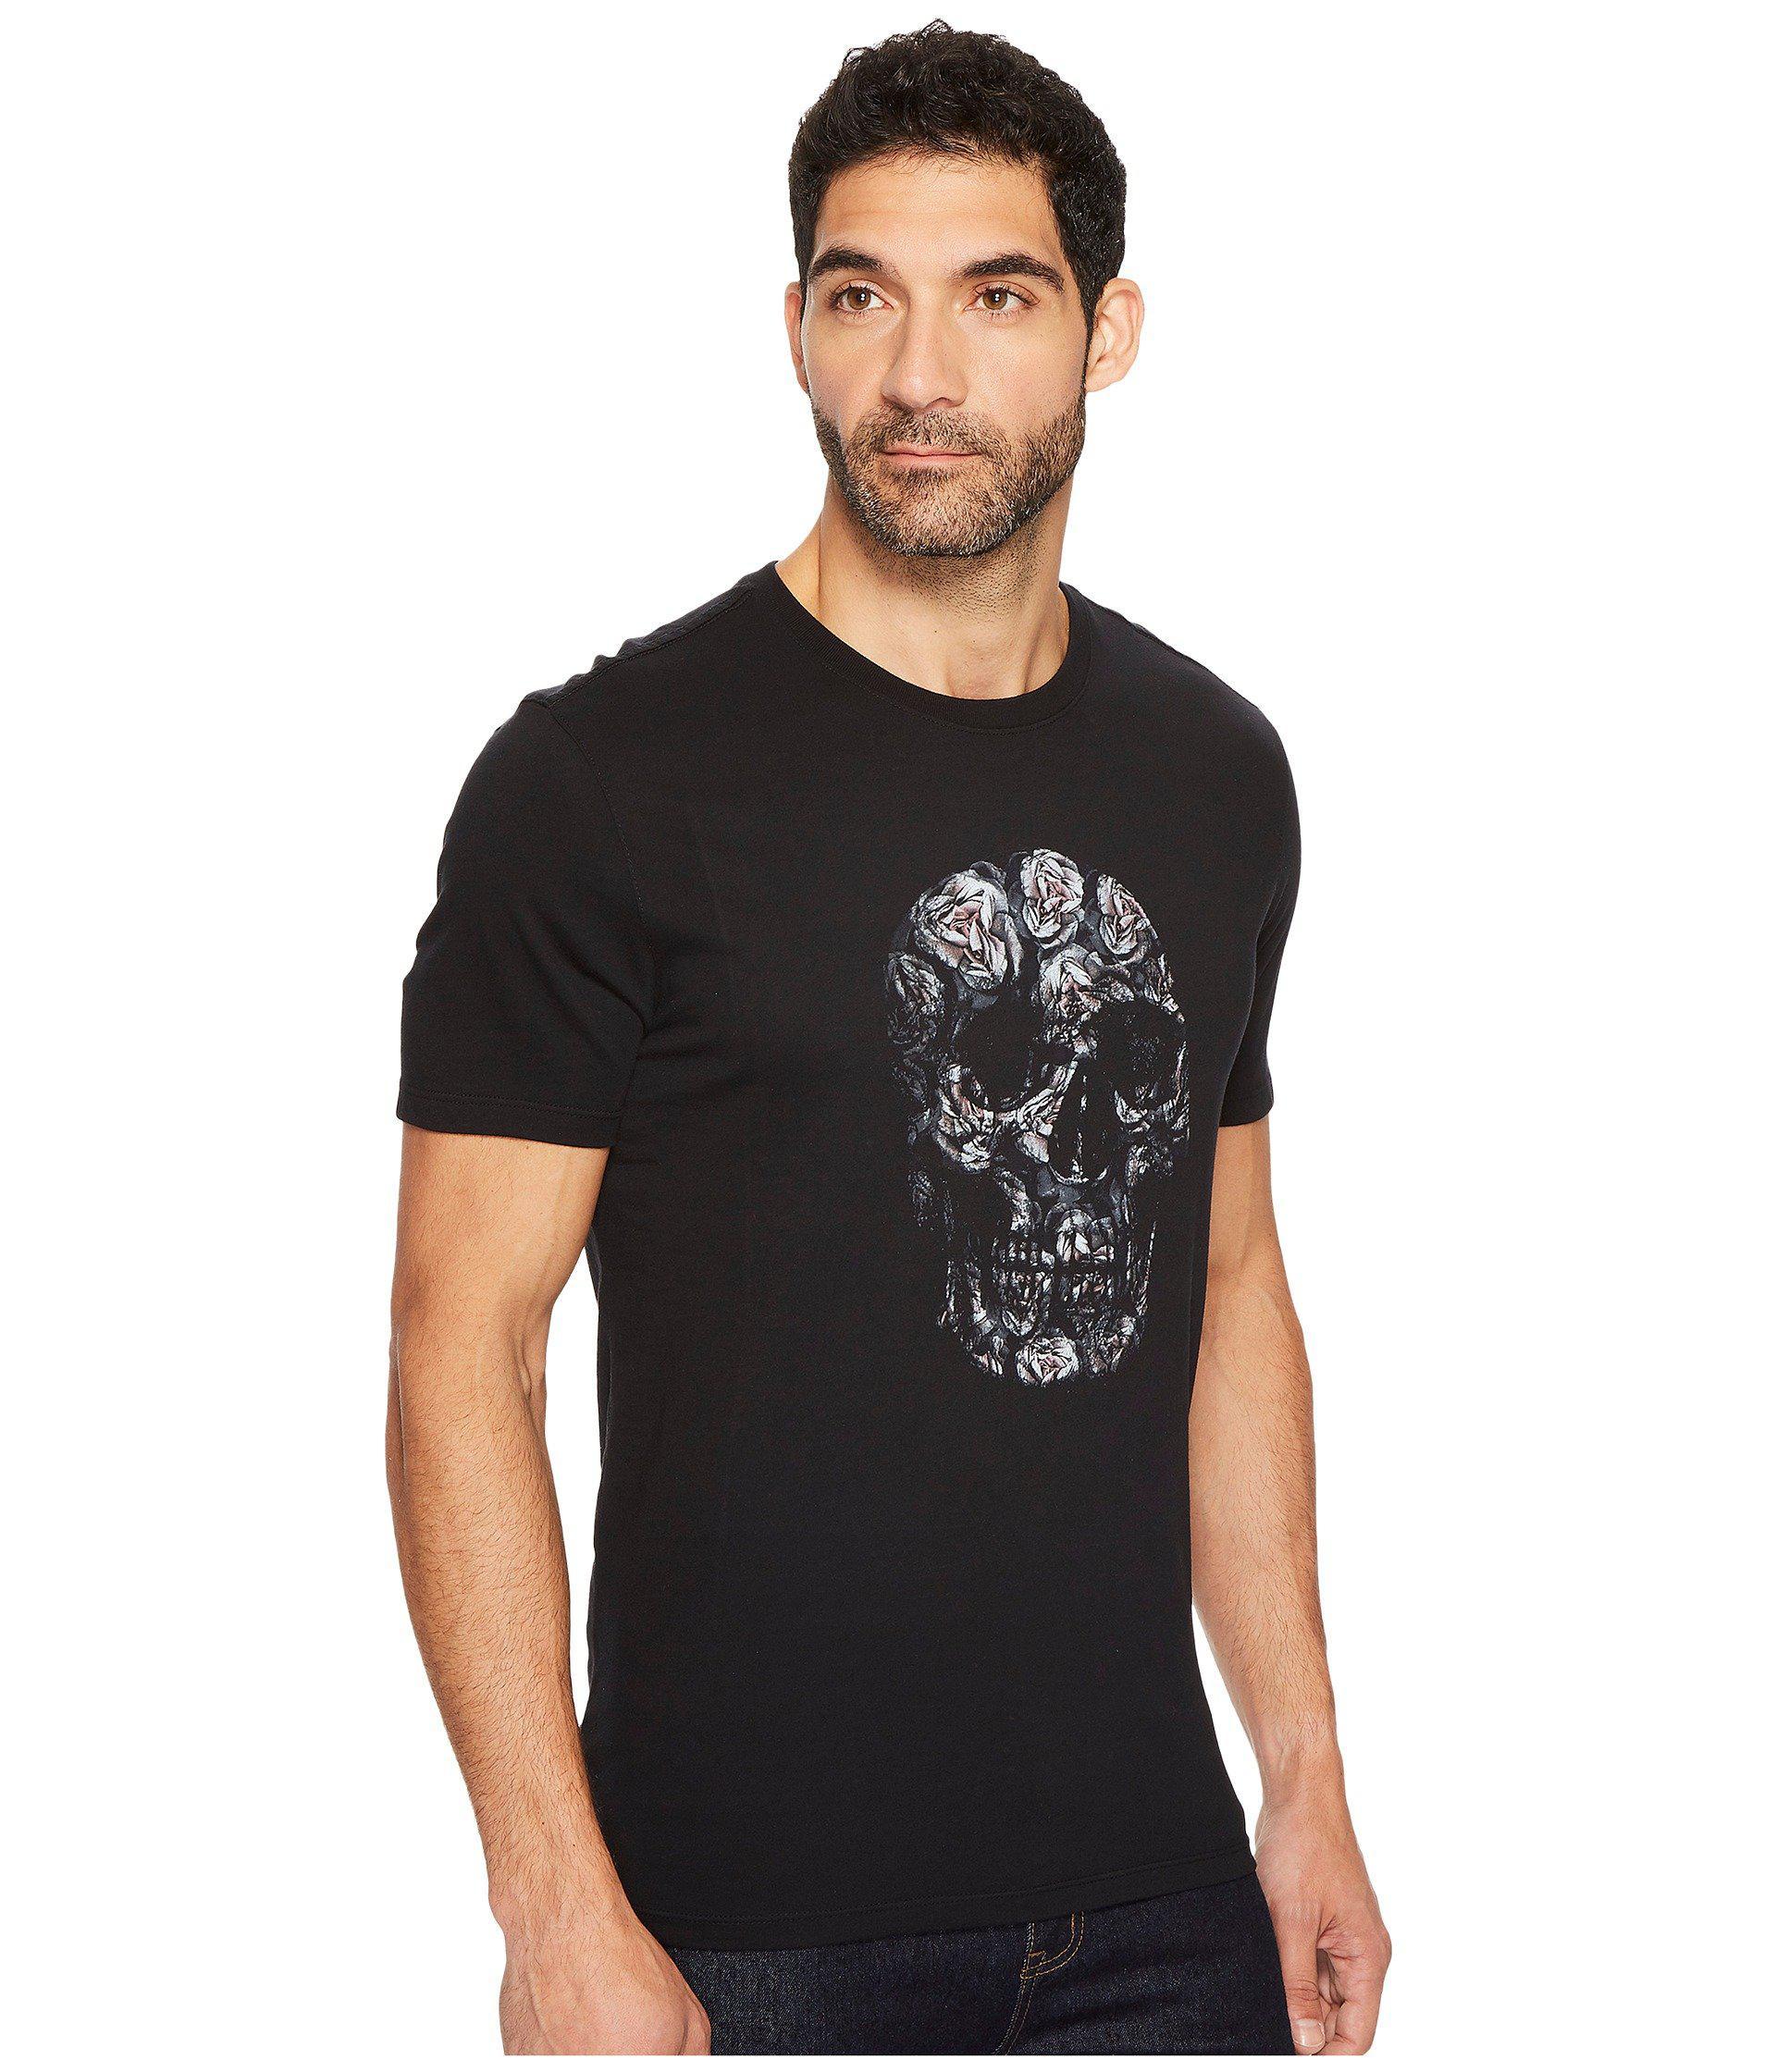 442f5cb41 John Varvatos Floral Skull Graphic Tee K3365t3b in Black for Men - Lyst